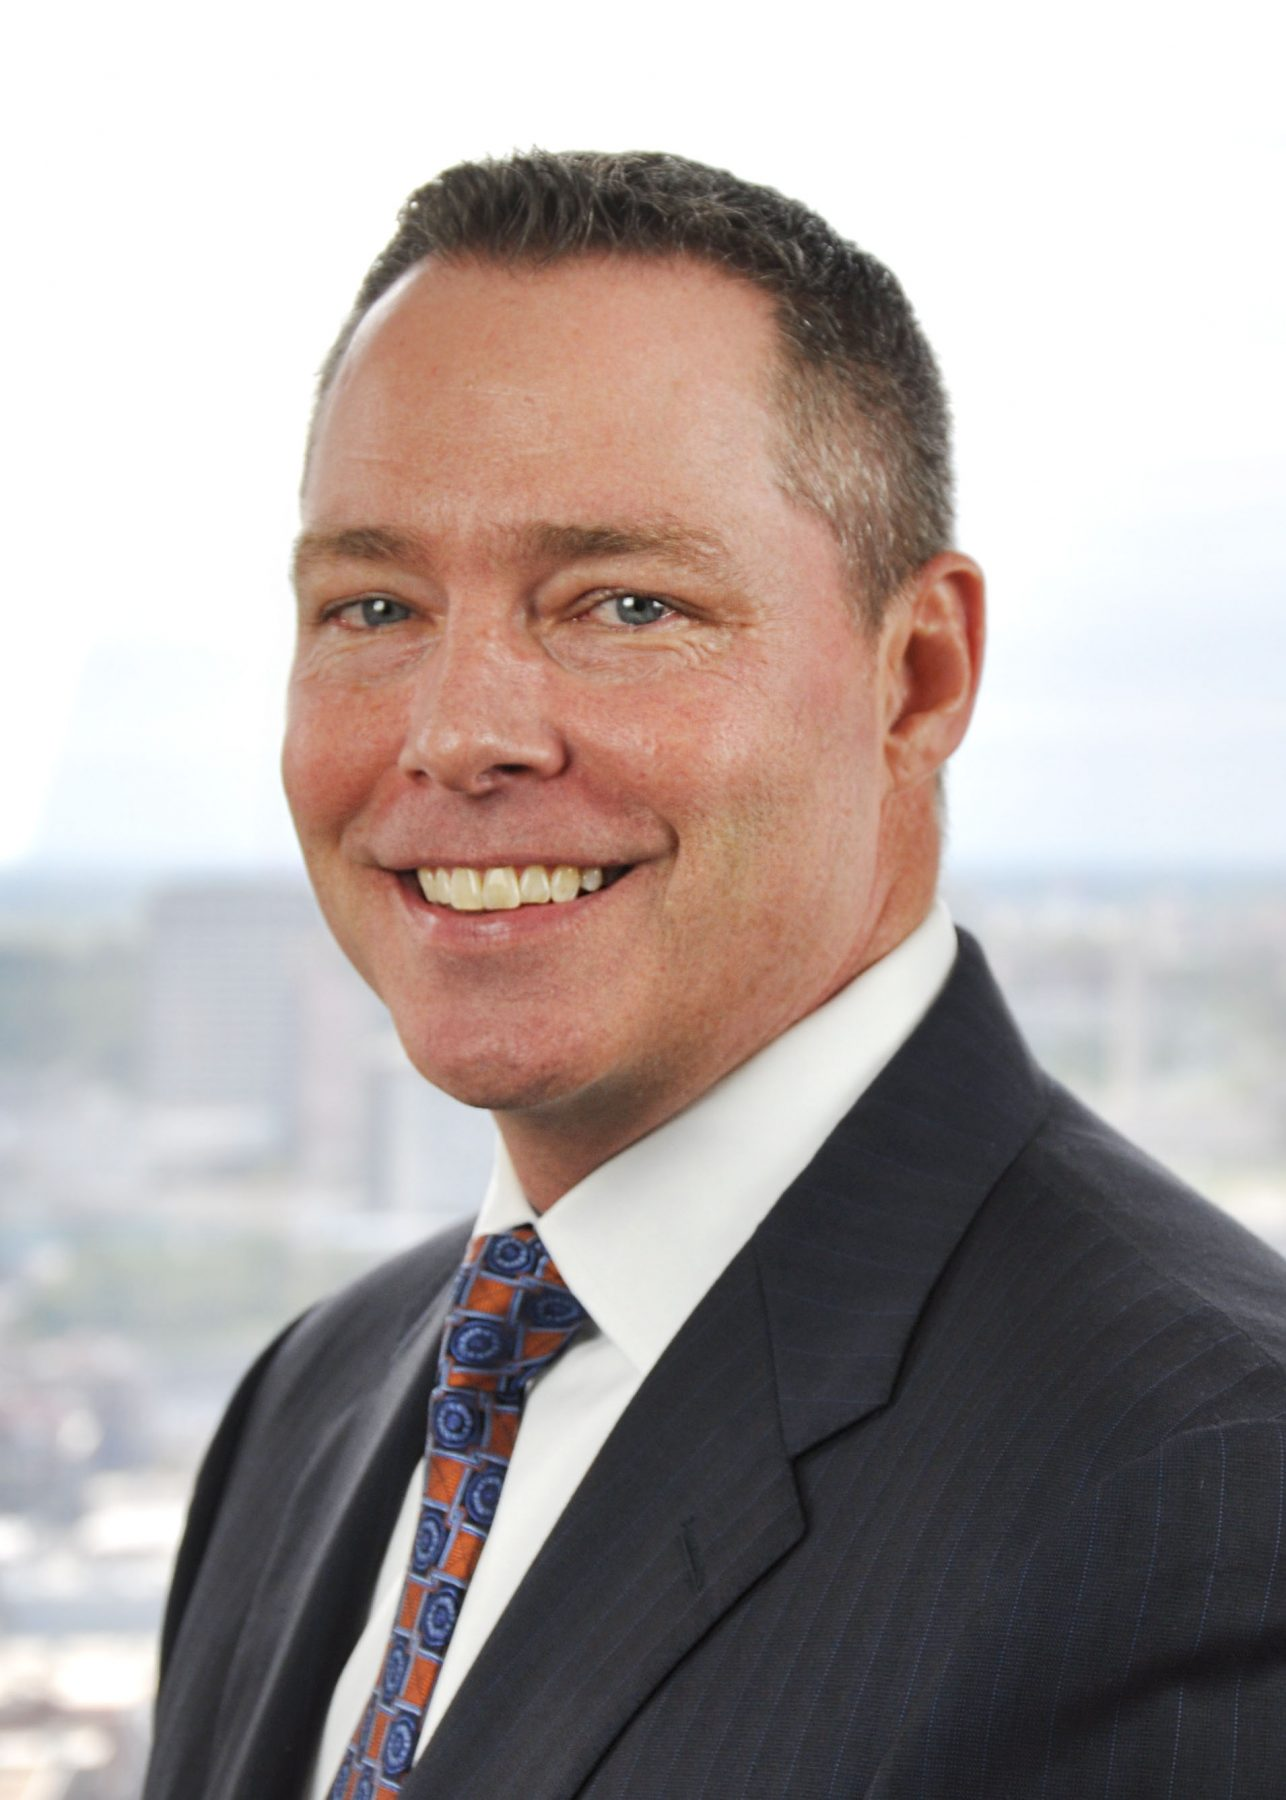 Steve Schrag Profile Image